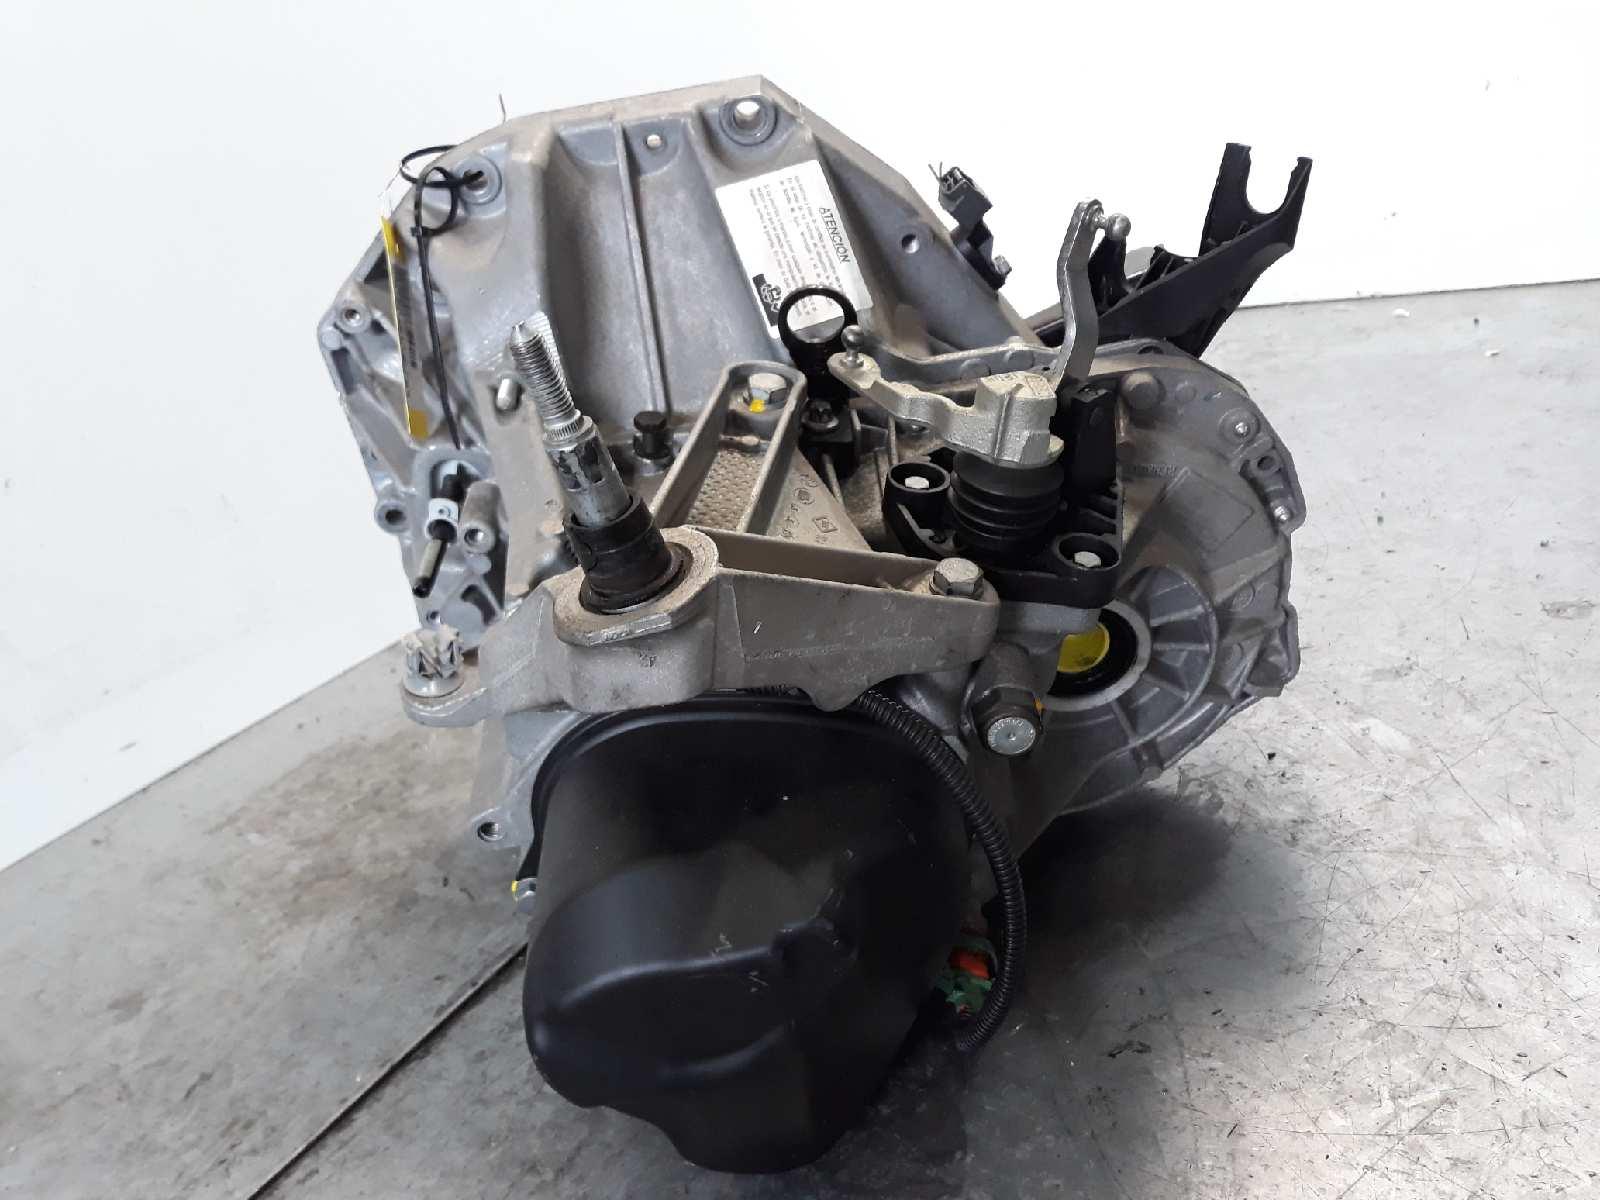 Manual Gearbox JR51244390144 RENAULT, CLIO III (BR0/1, CR0/1)